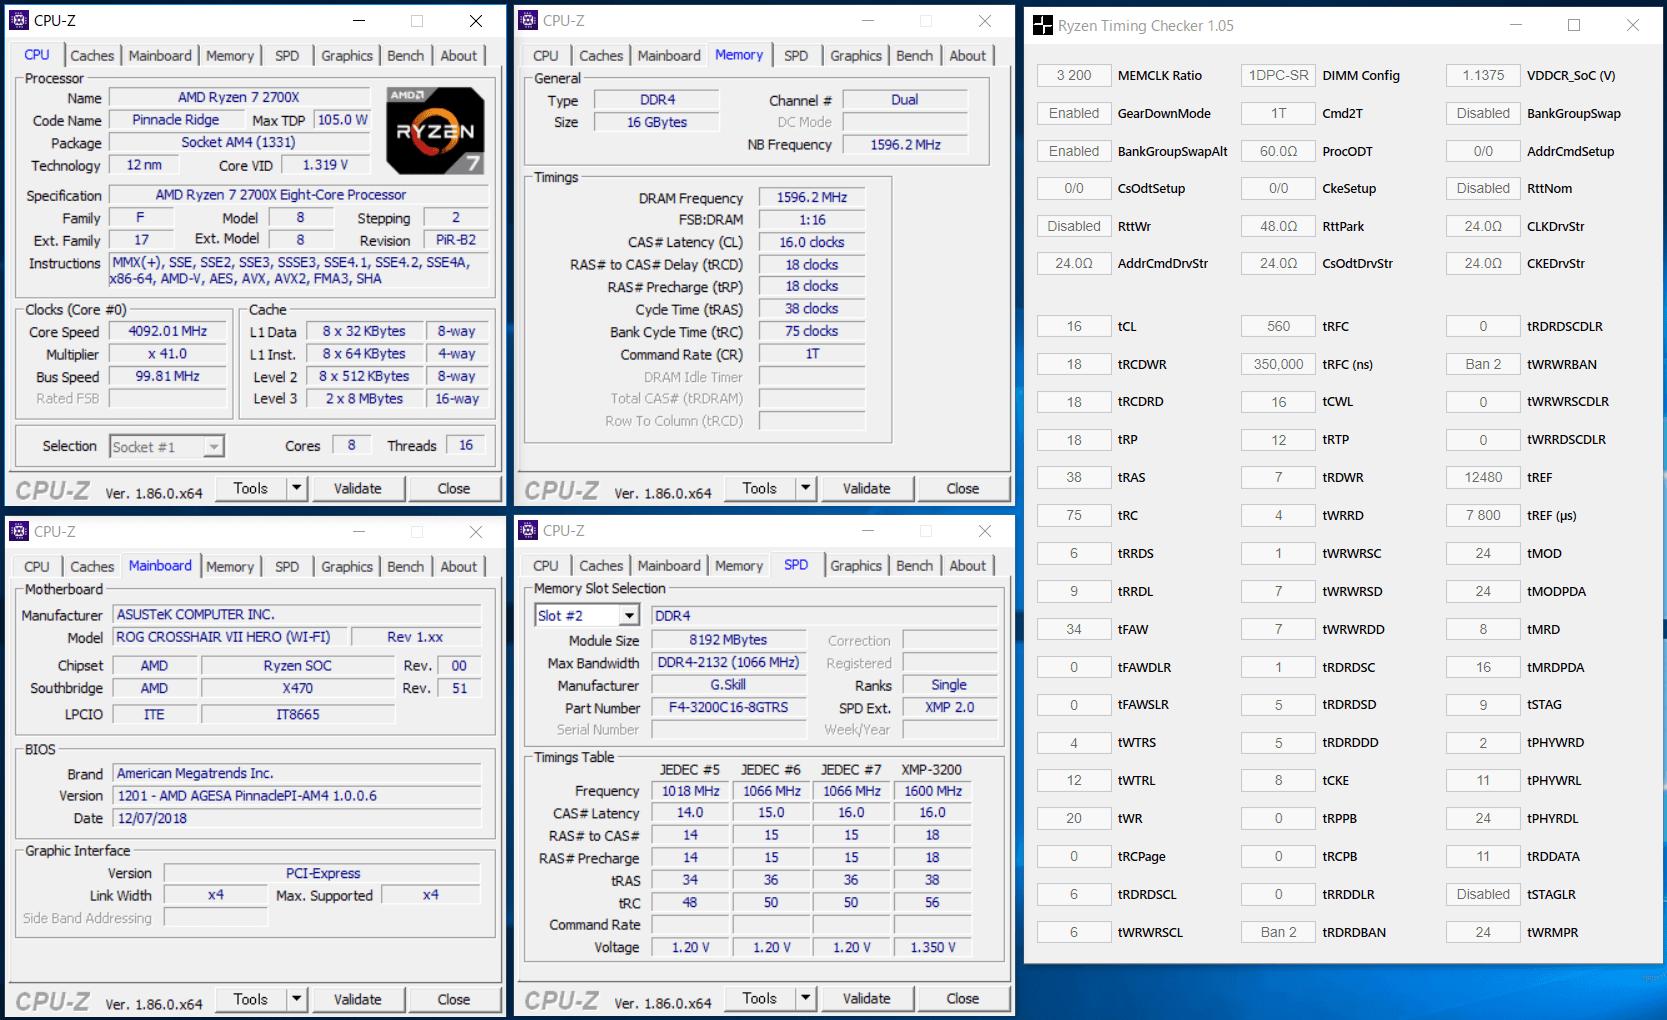 F4-3200C16D-16GTRS_OC_BIOS_Ryzen 7 2700X_X470 (1)